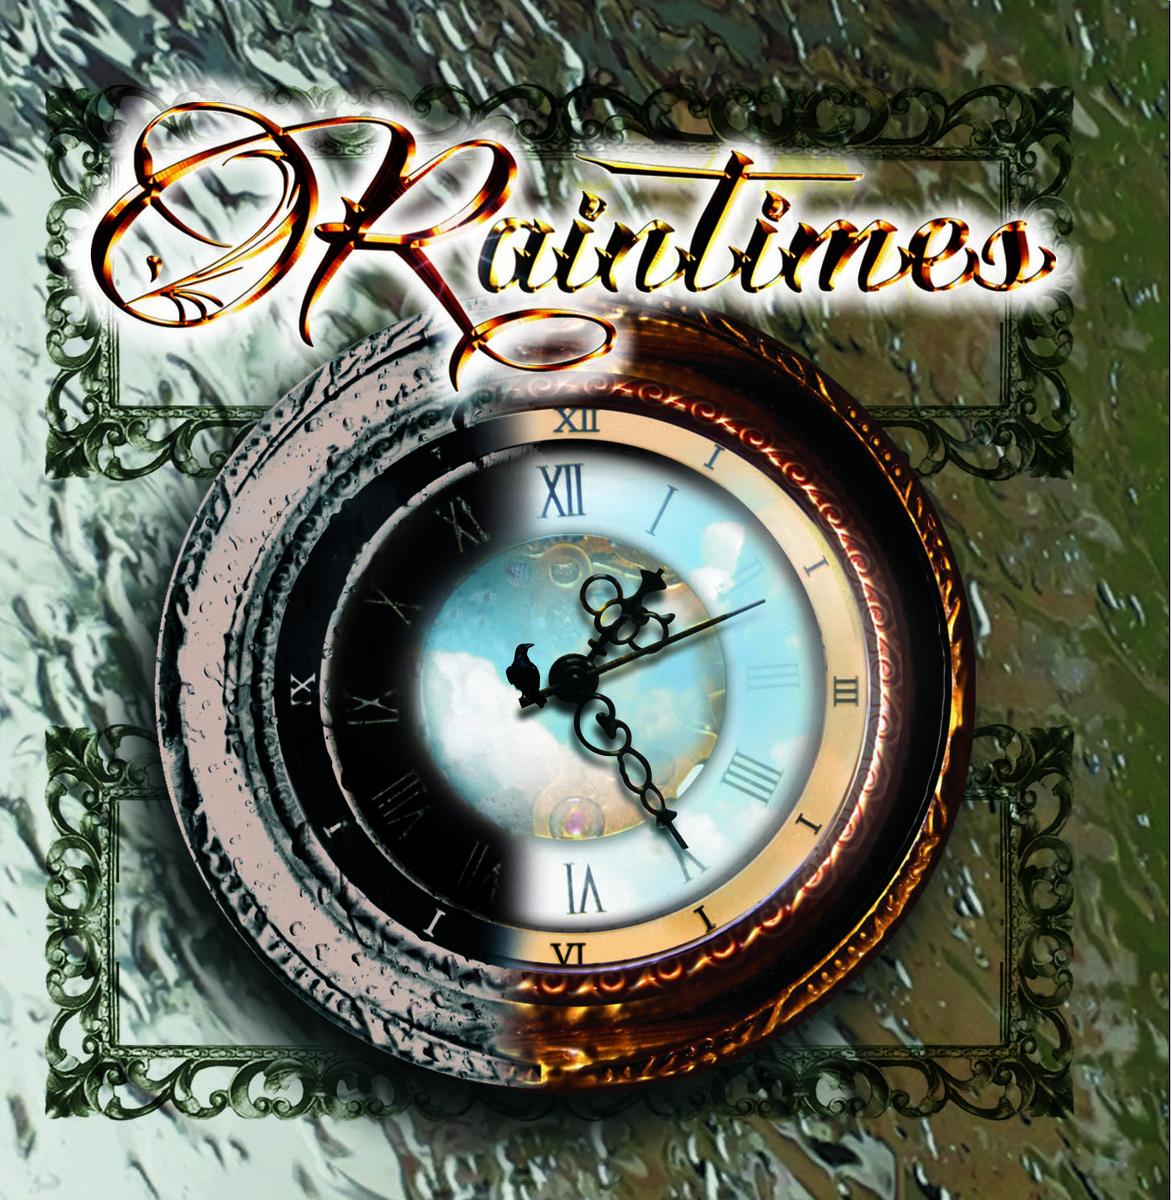 Raintimes – Raintimes